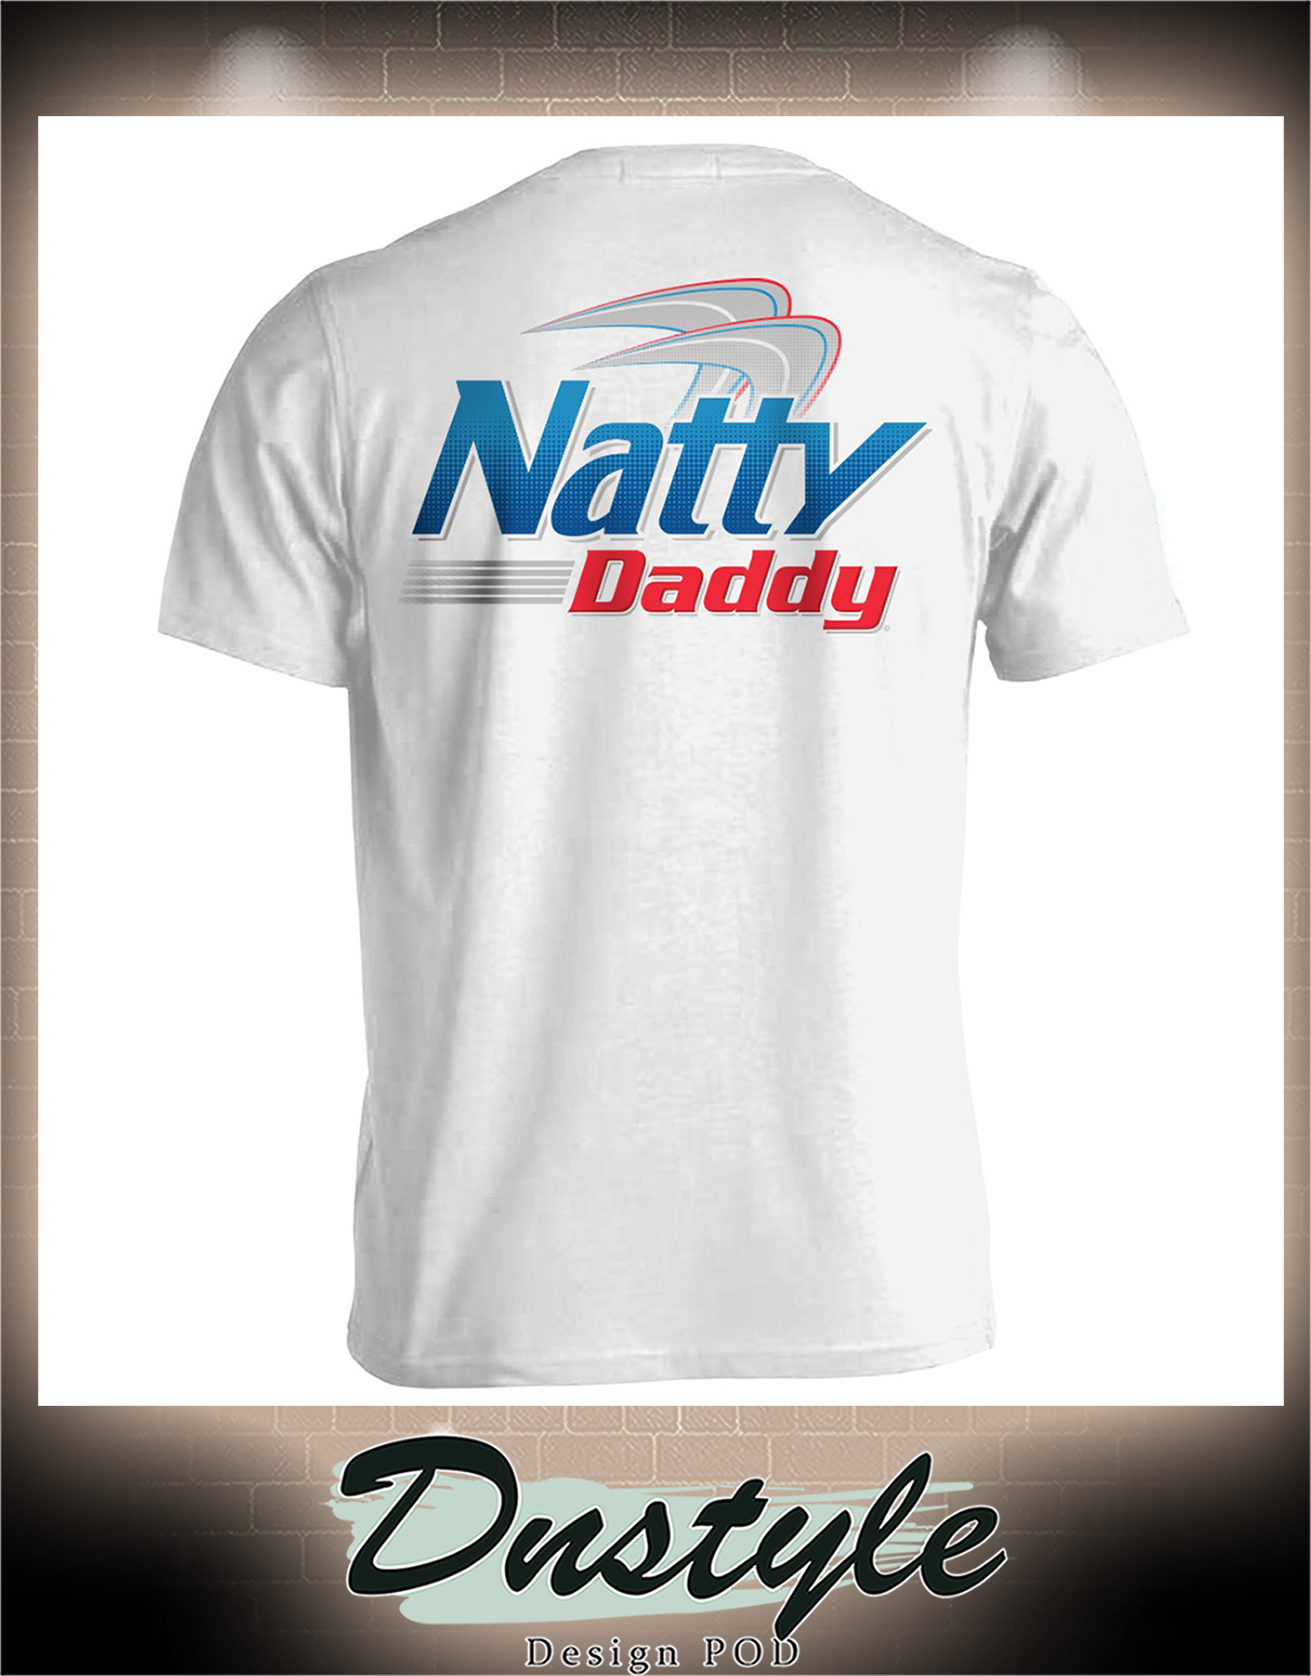 Natural light beer Natty daddy shirt 2